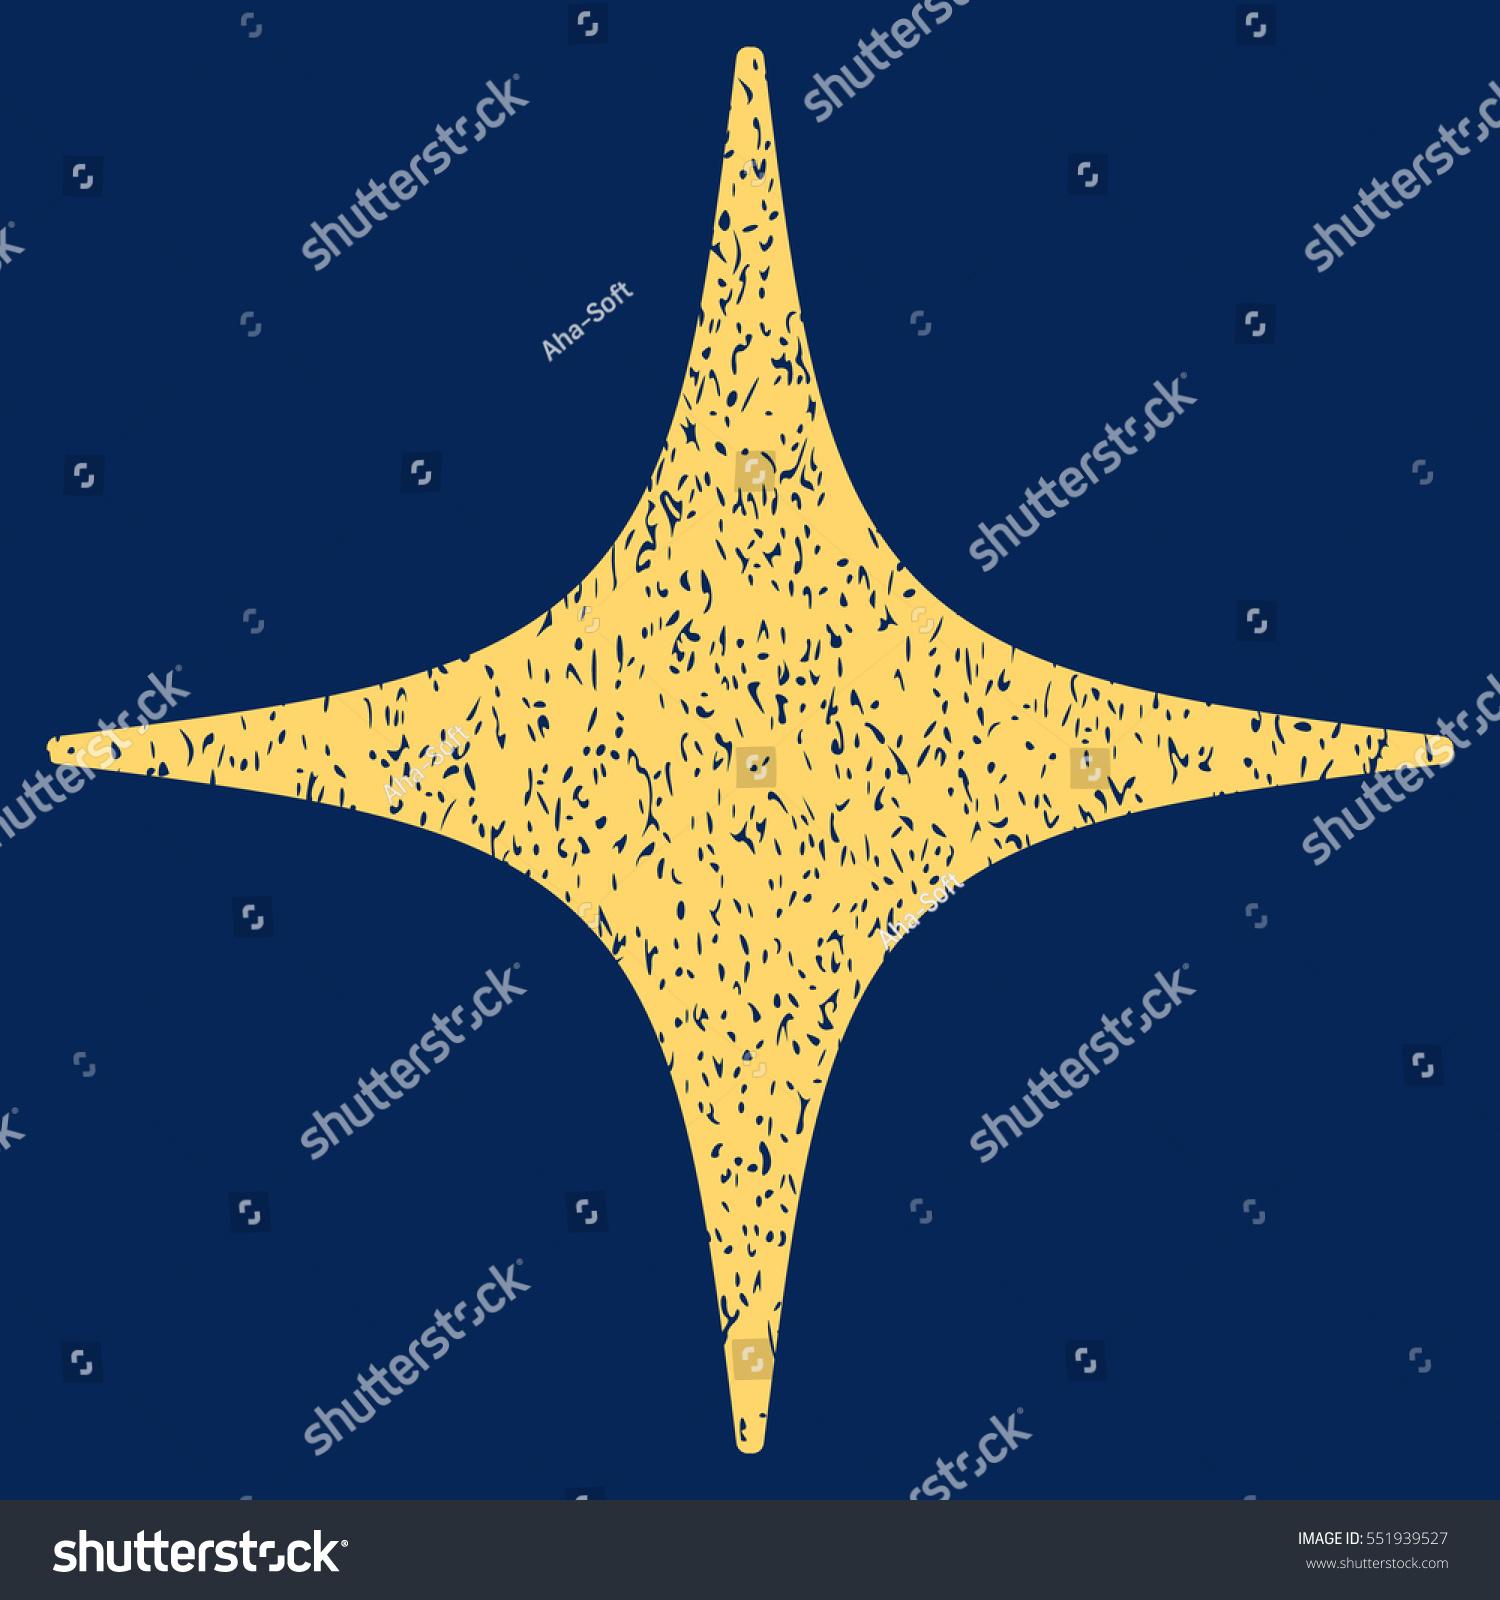 Star Grainy Textured Icon Overlay Watermark Stock Vector